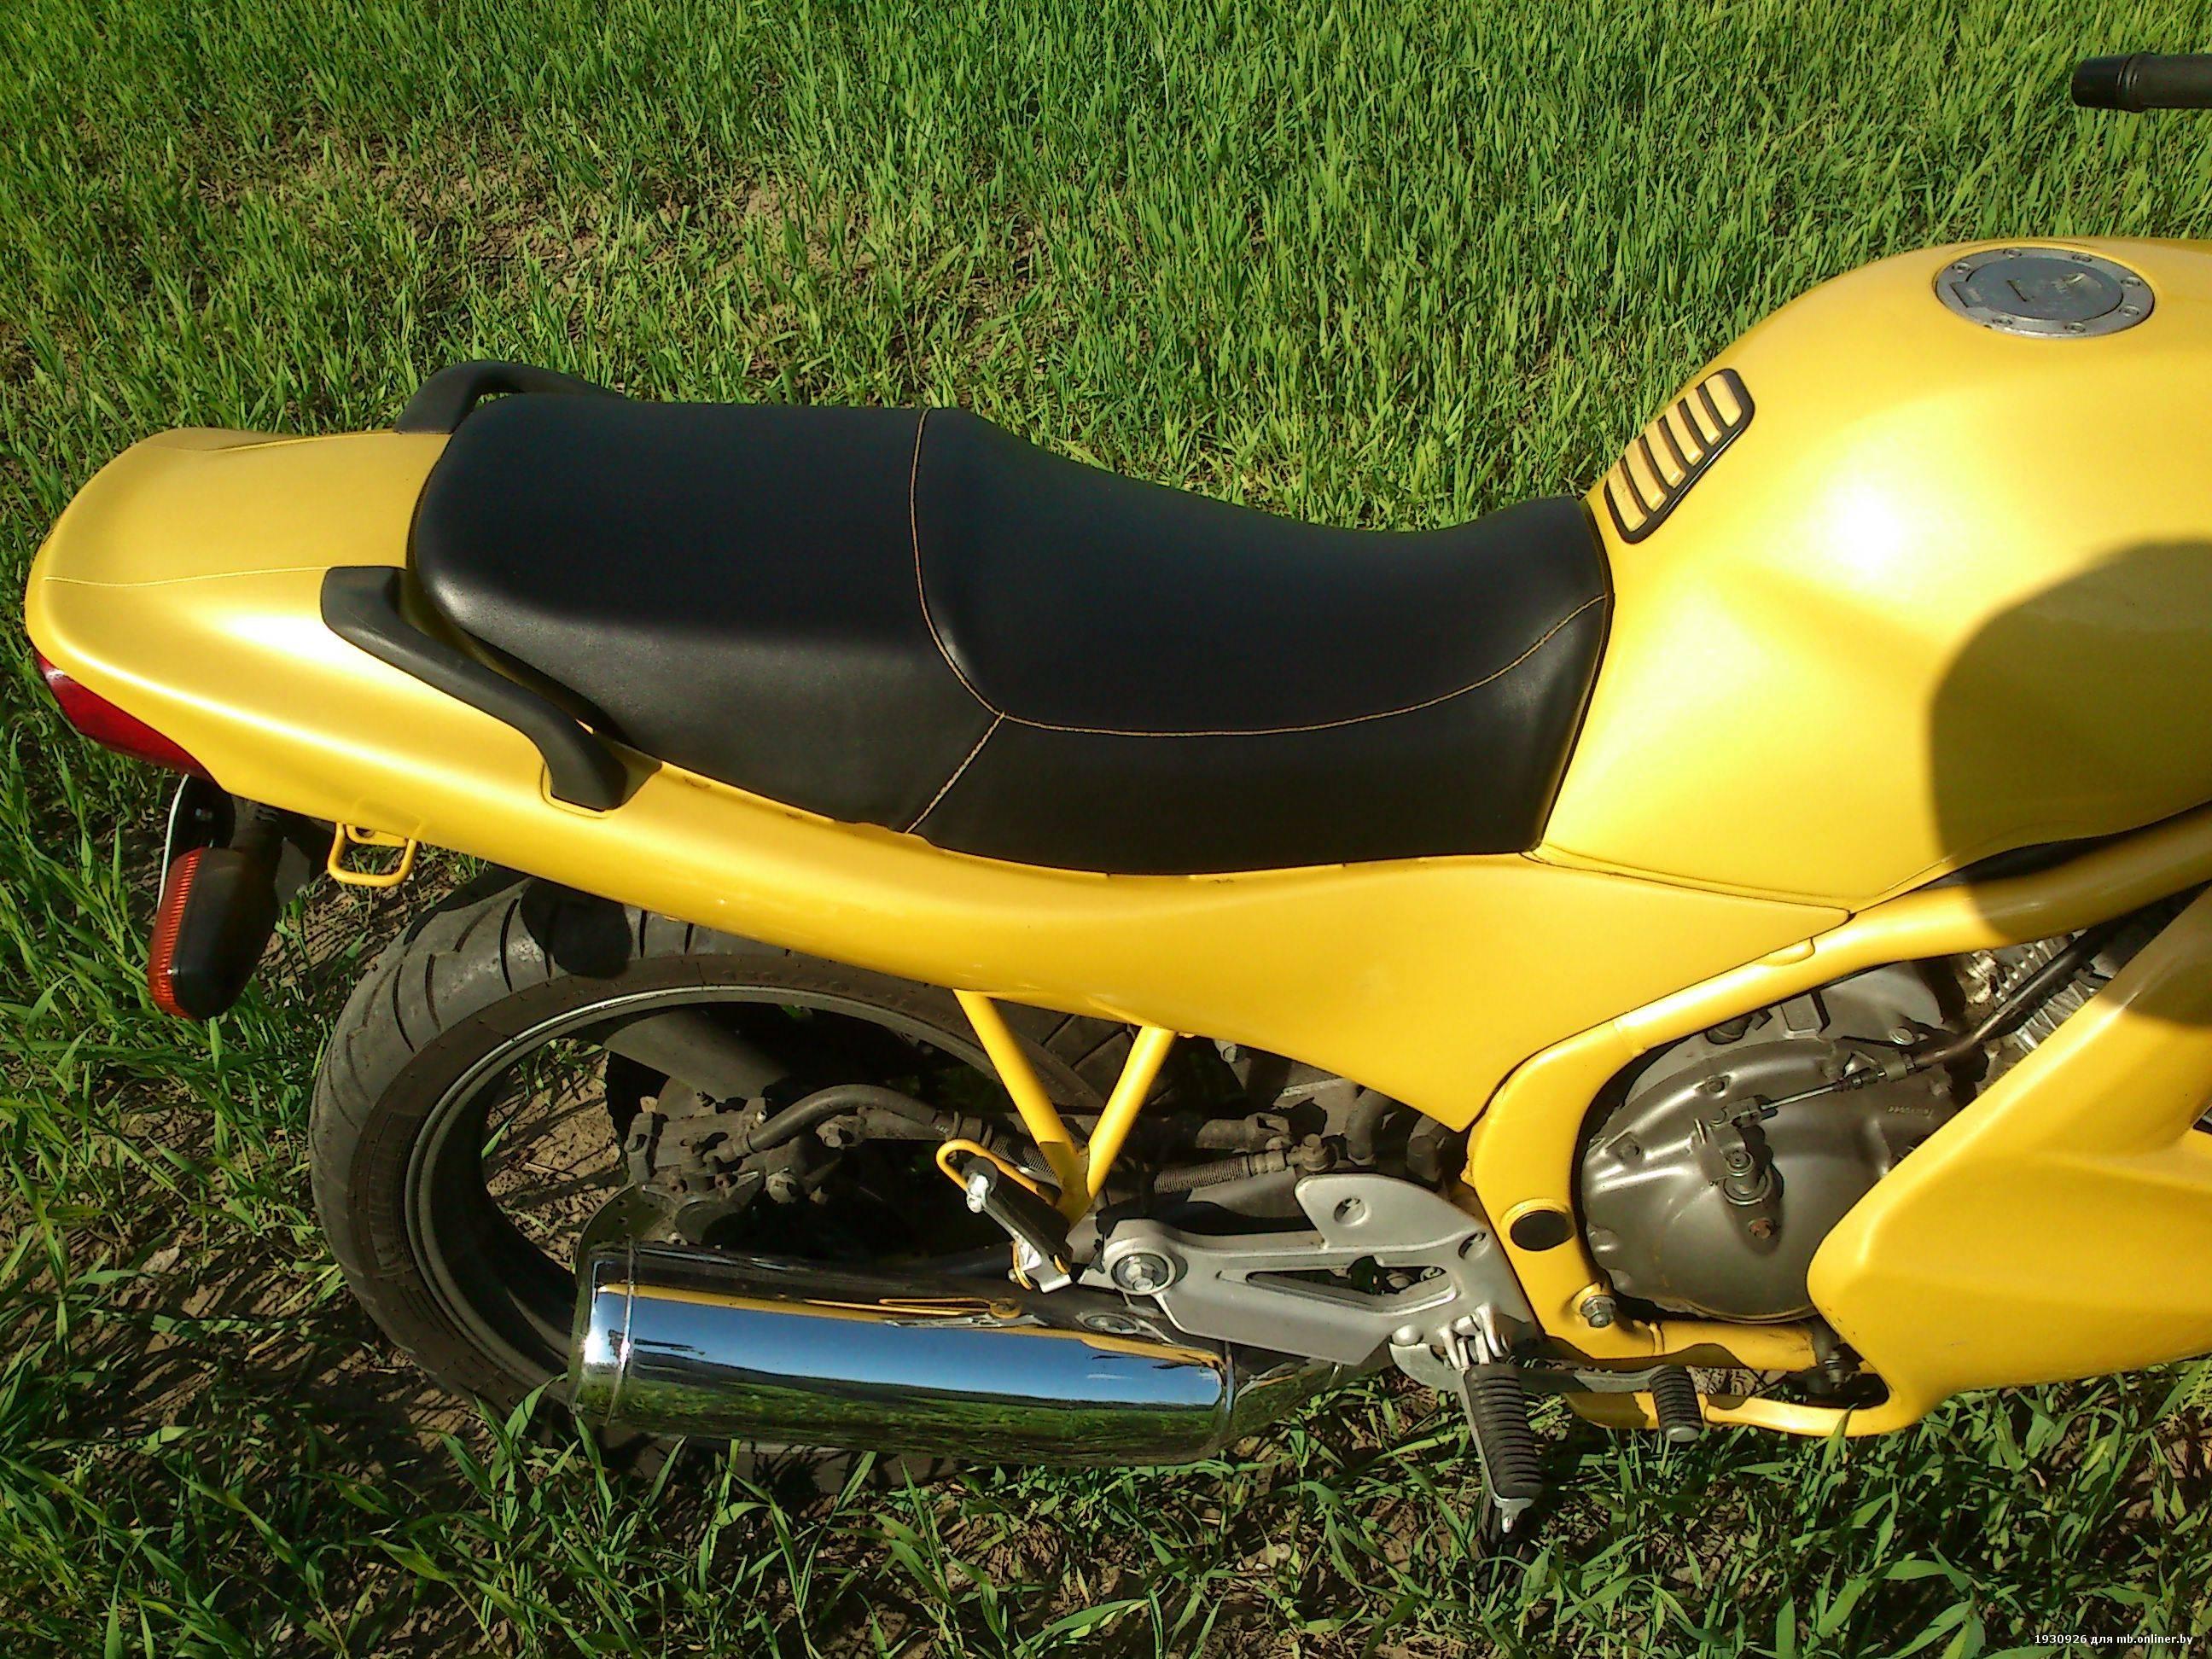 Yamaha divesion xj600s 1994 г